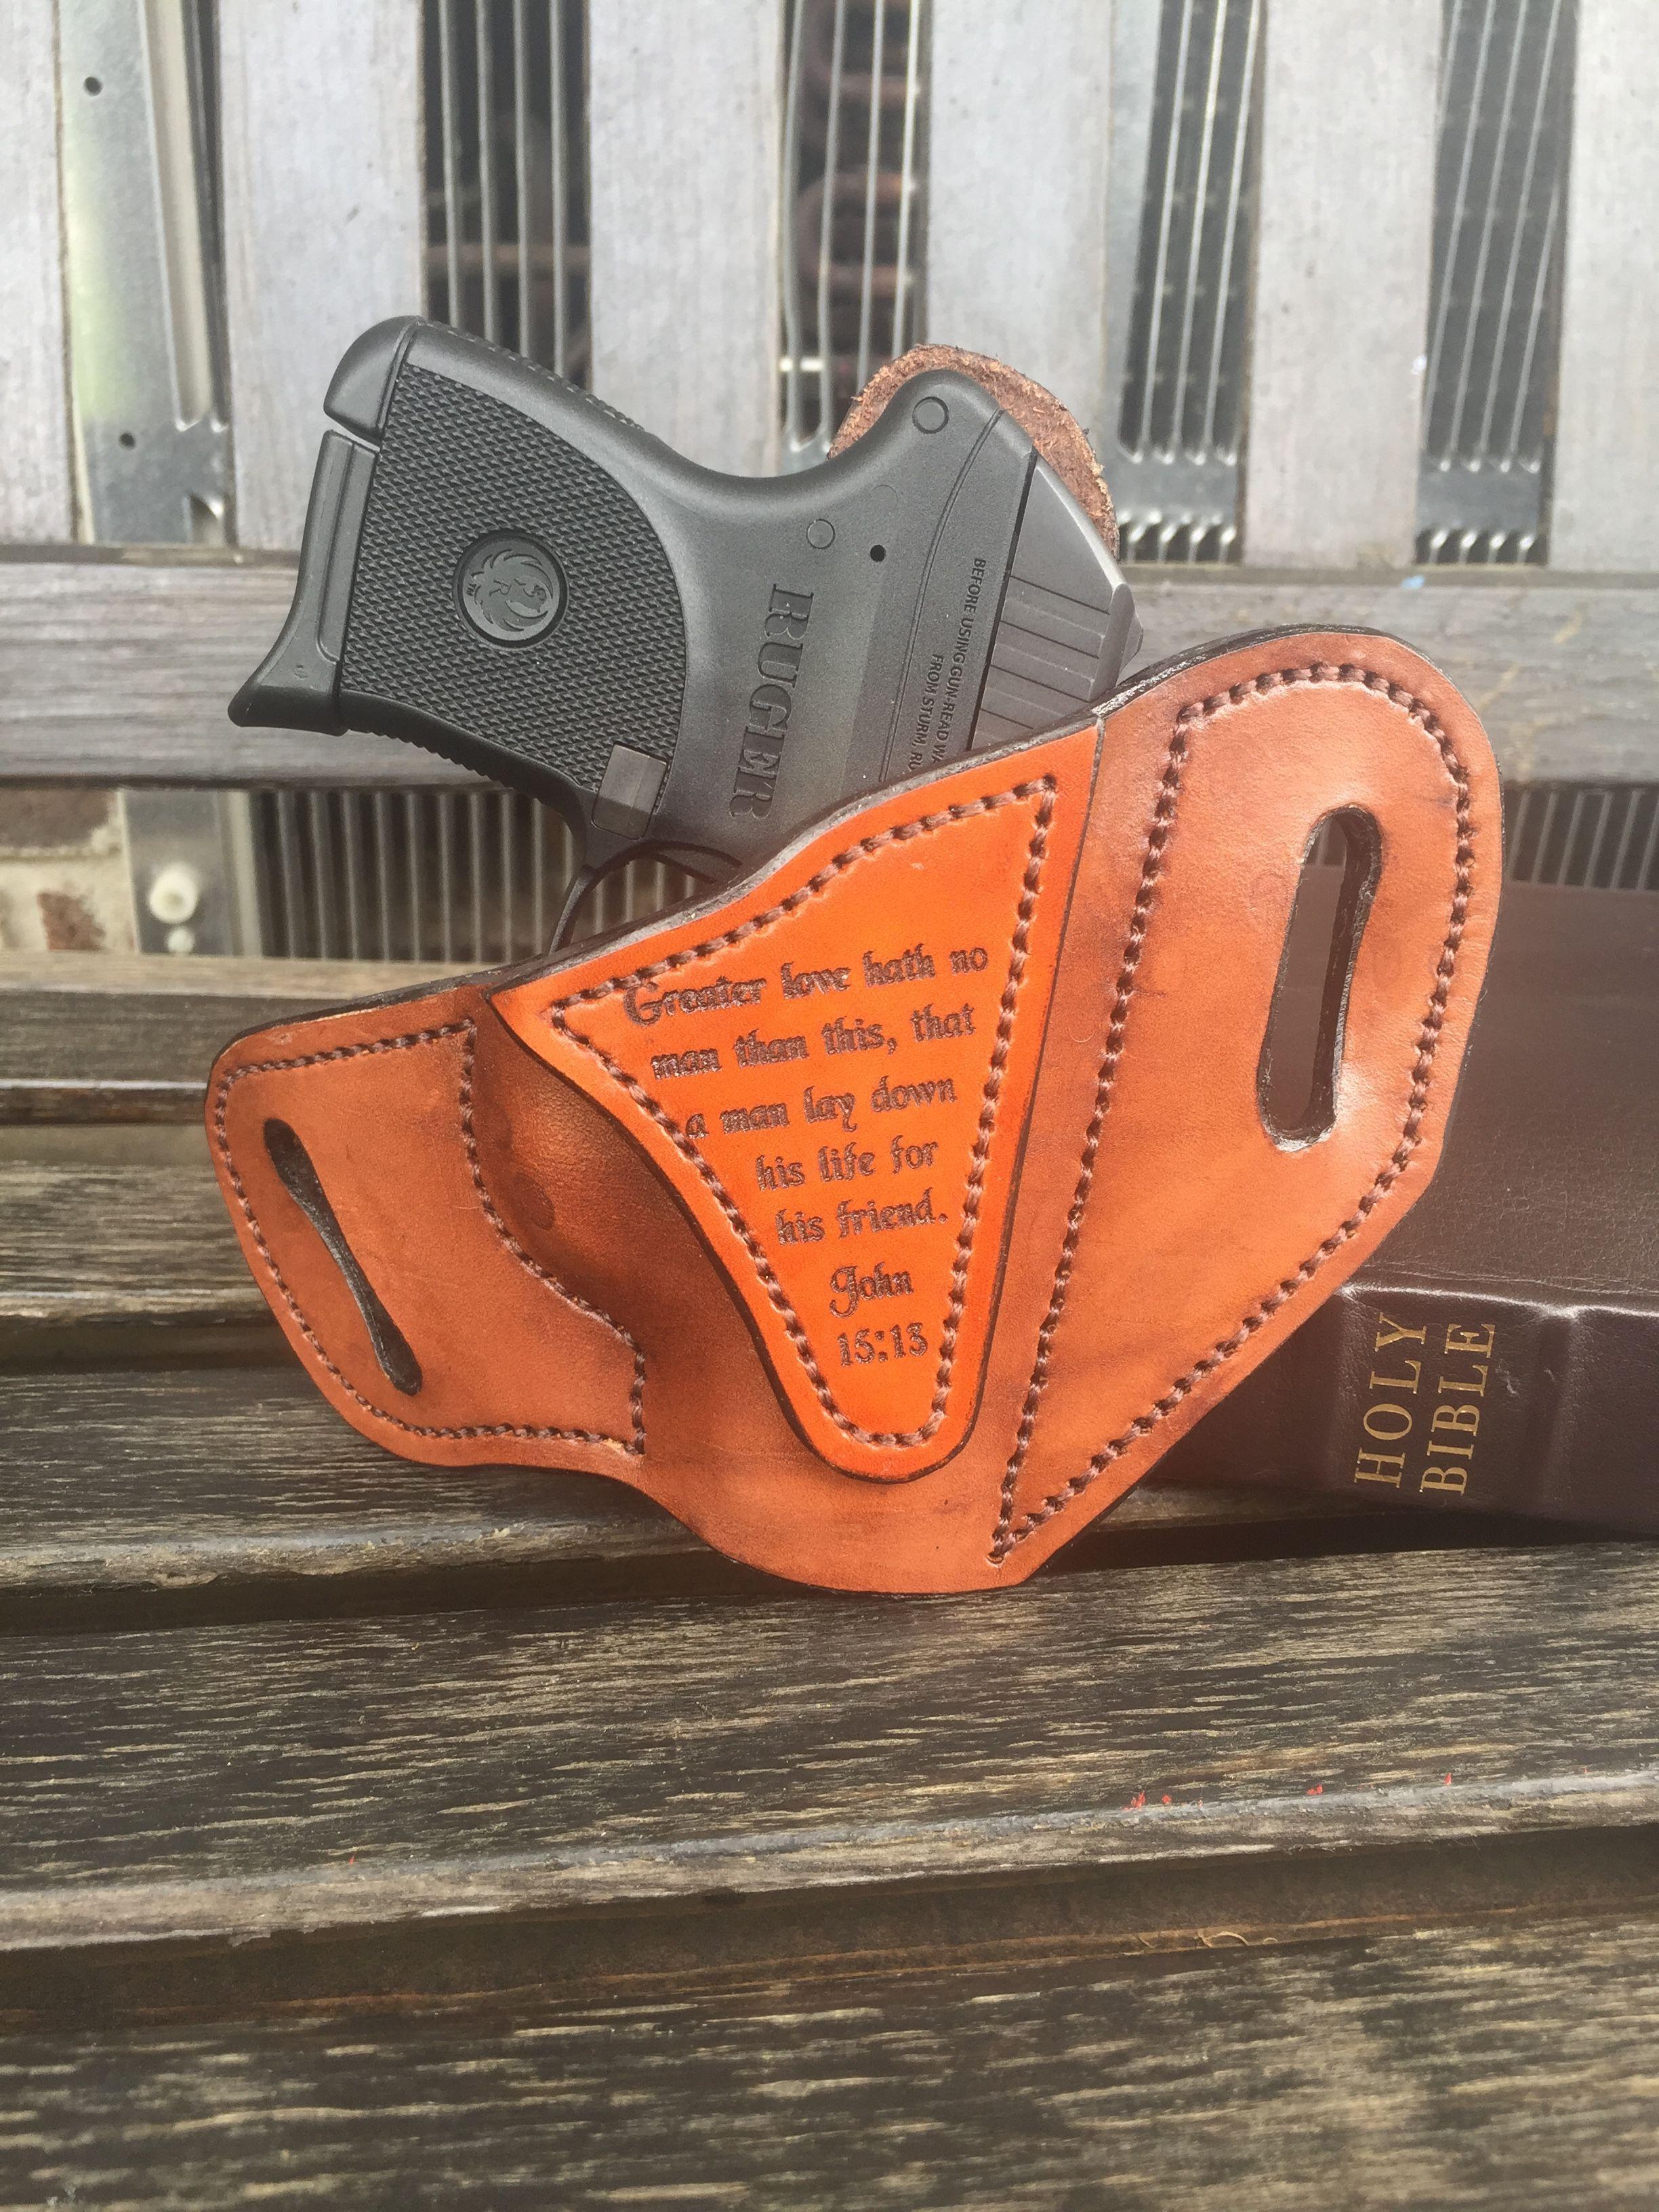 Ruger LCP OWB dark brown engraved Bible verse holster